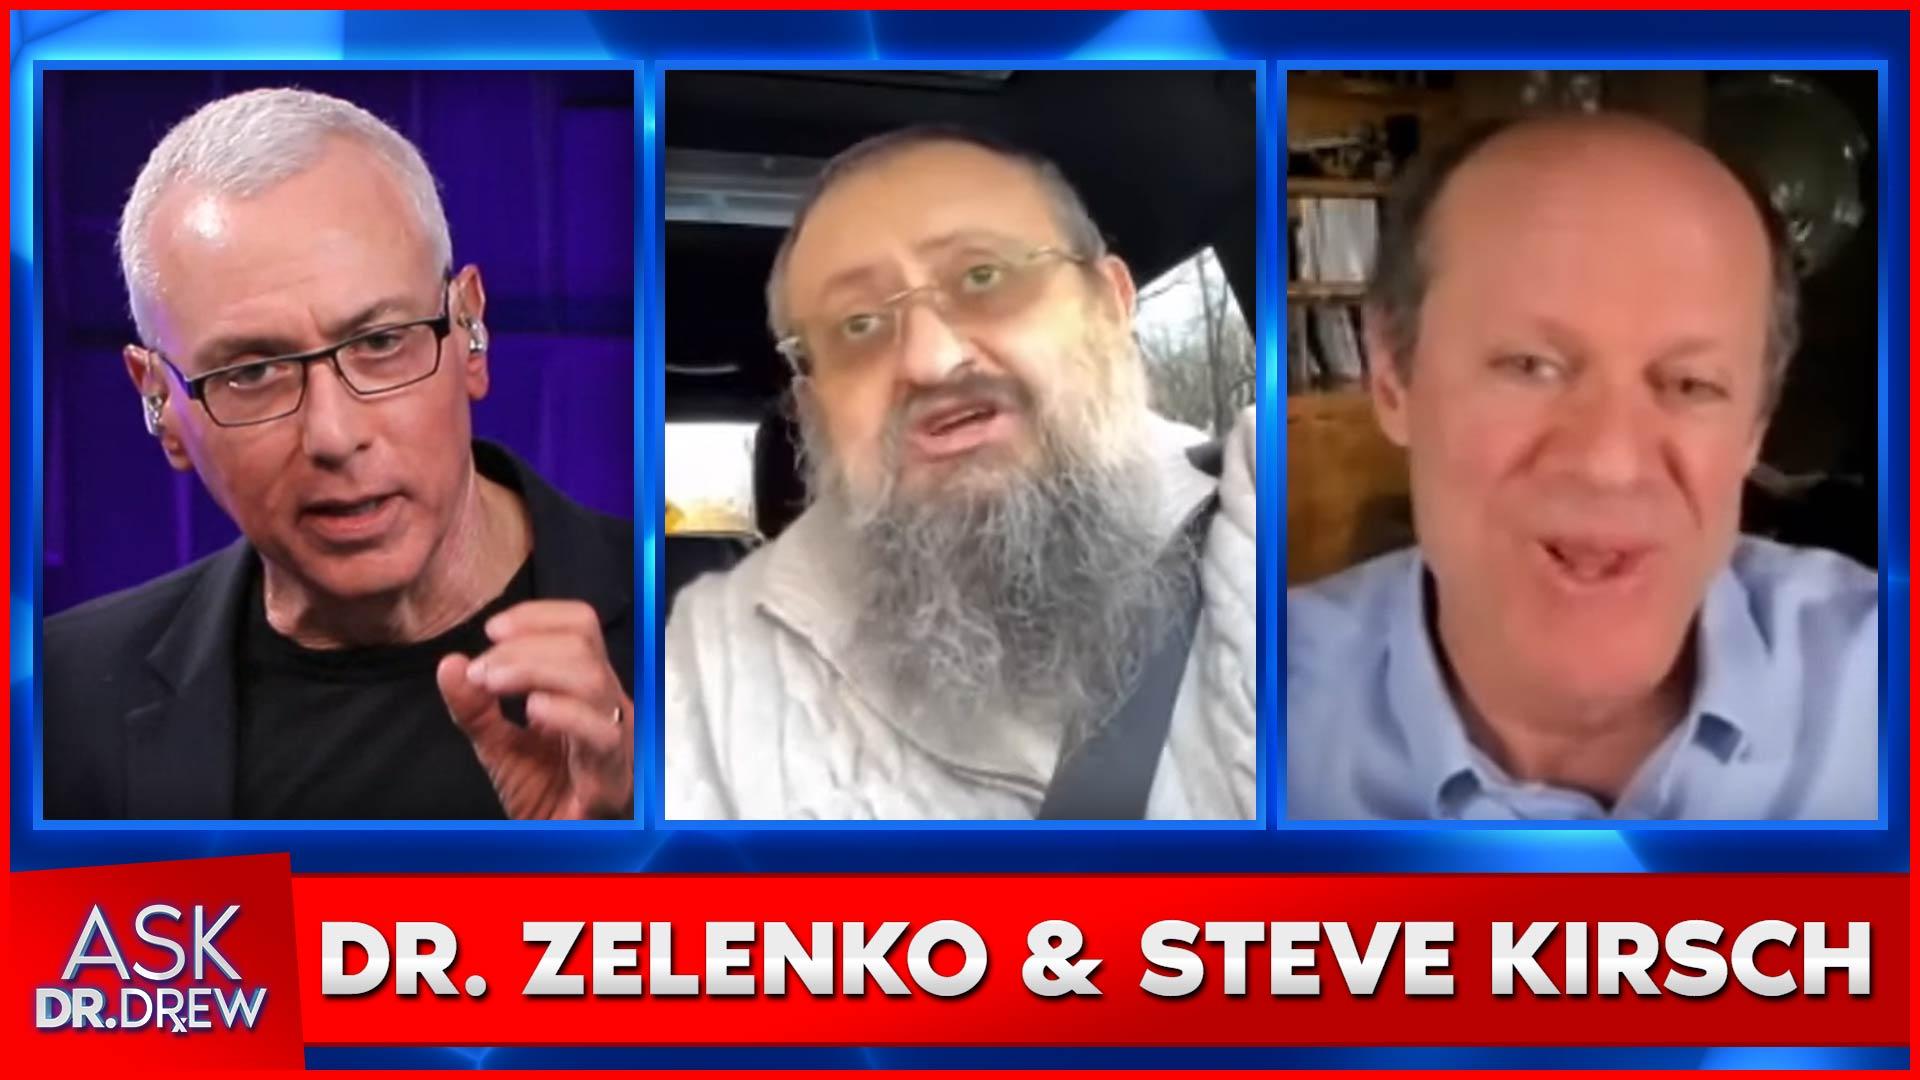 Dr. Vladimir Zelenko & Steve Kirsch Discuss COVID-19, Dr. Fauci, Vaccines & More on Ask Dr. Drew